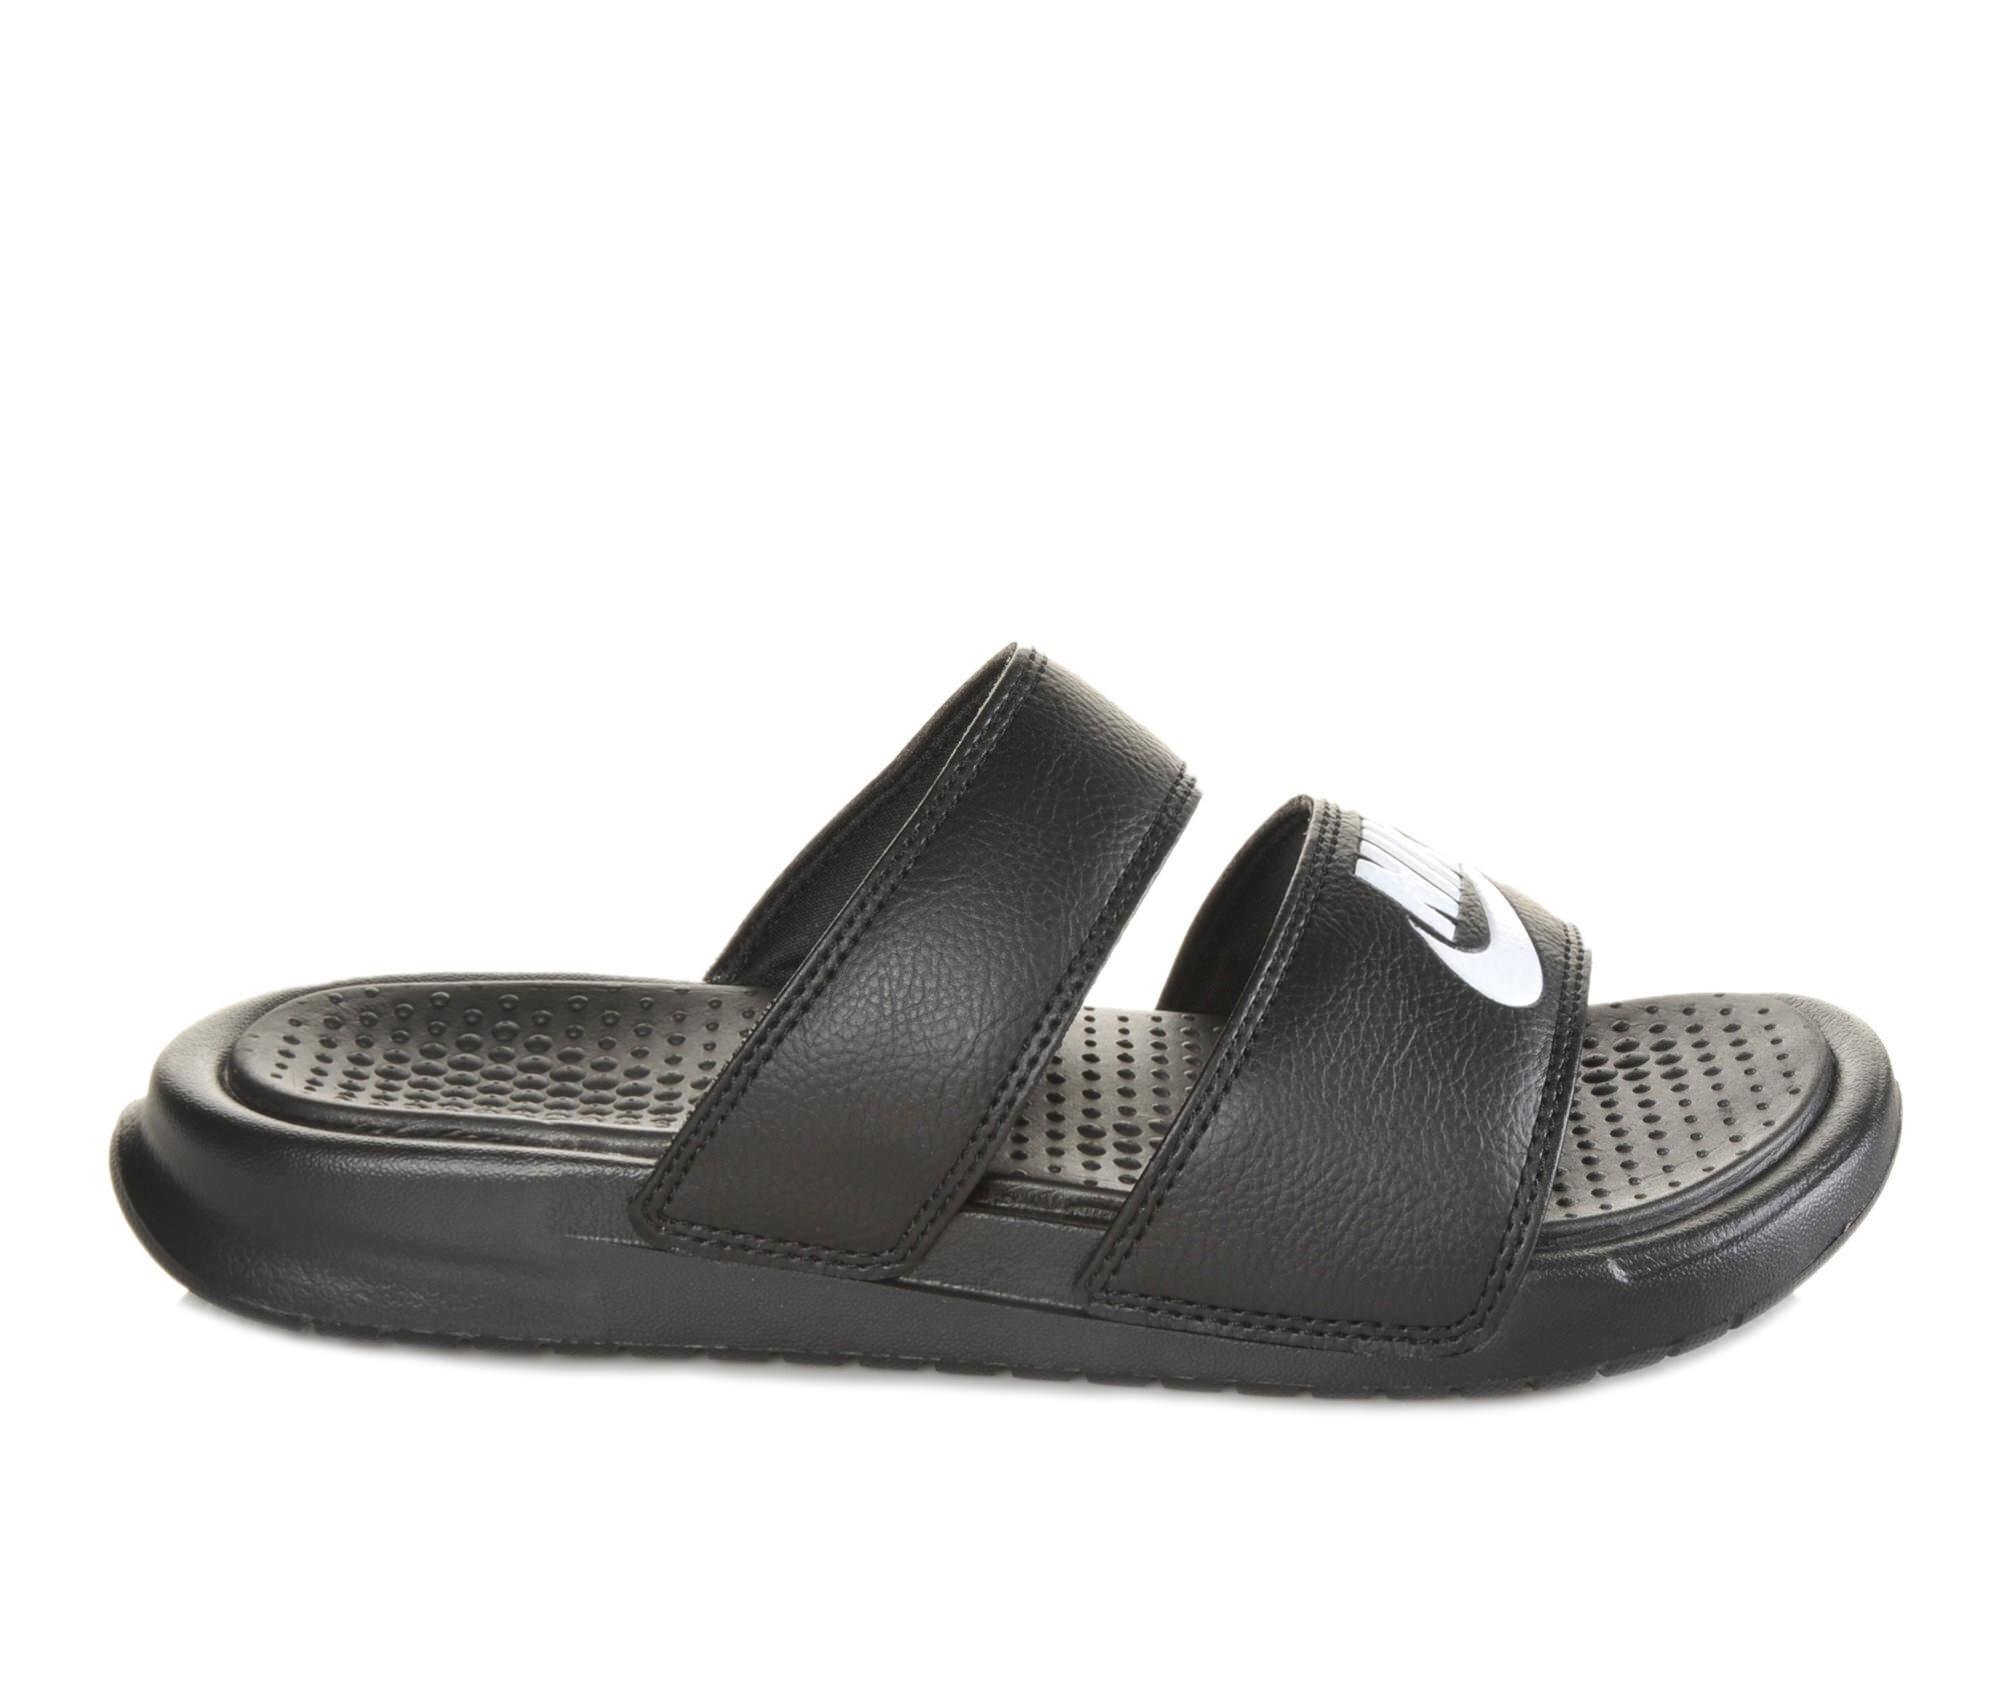 Women's Nike Benassi Duo Slide Sandals Black/White